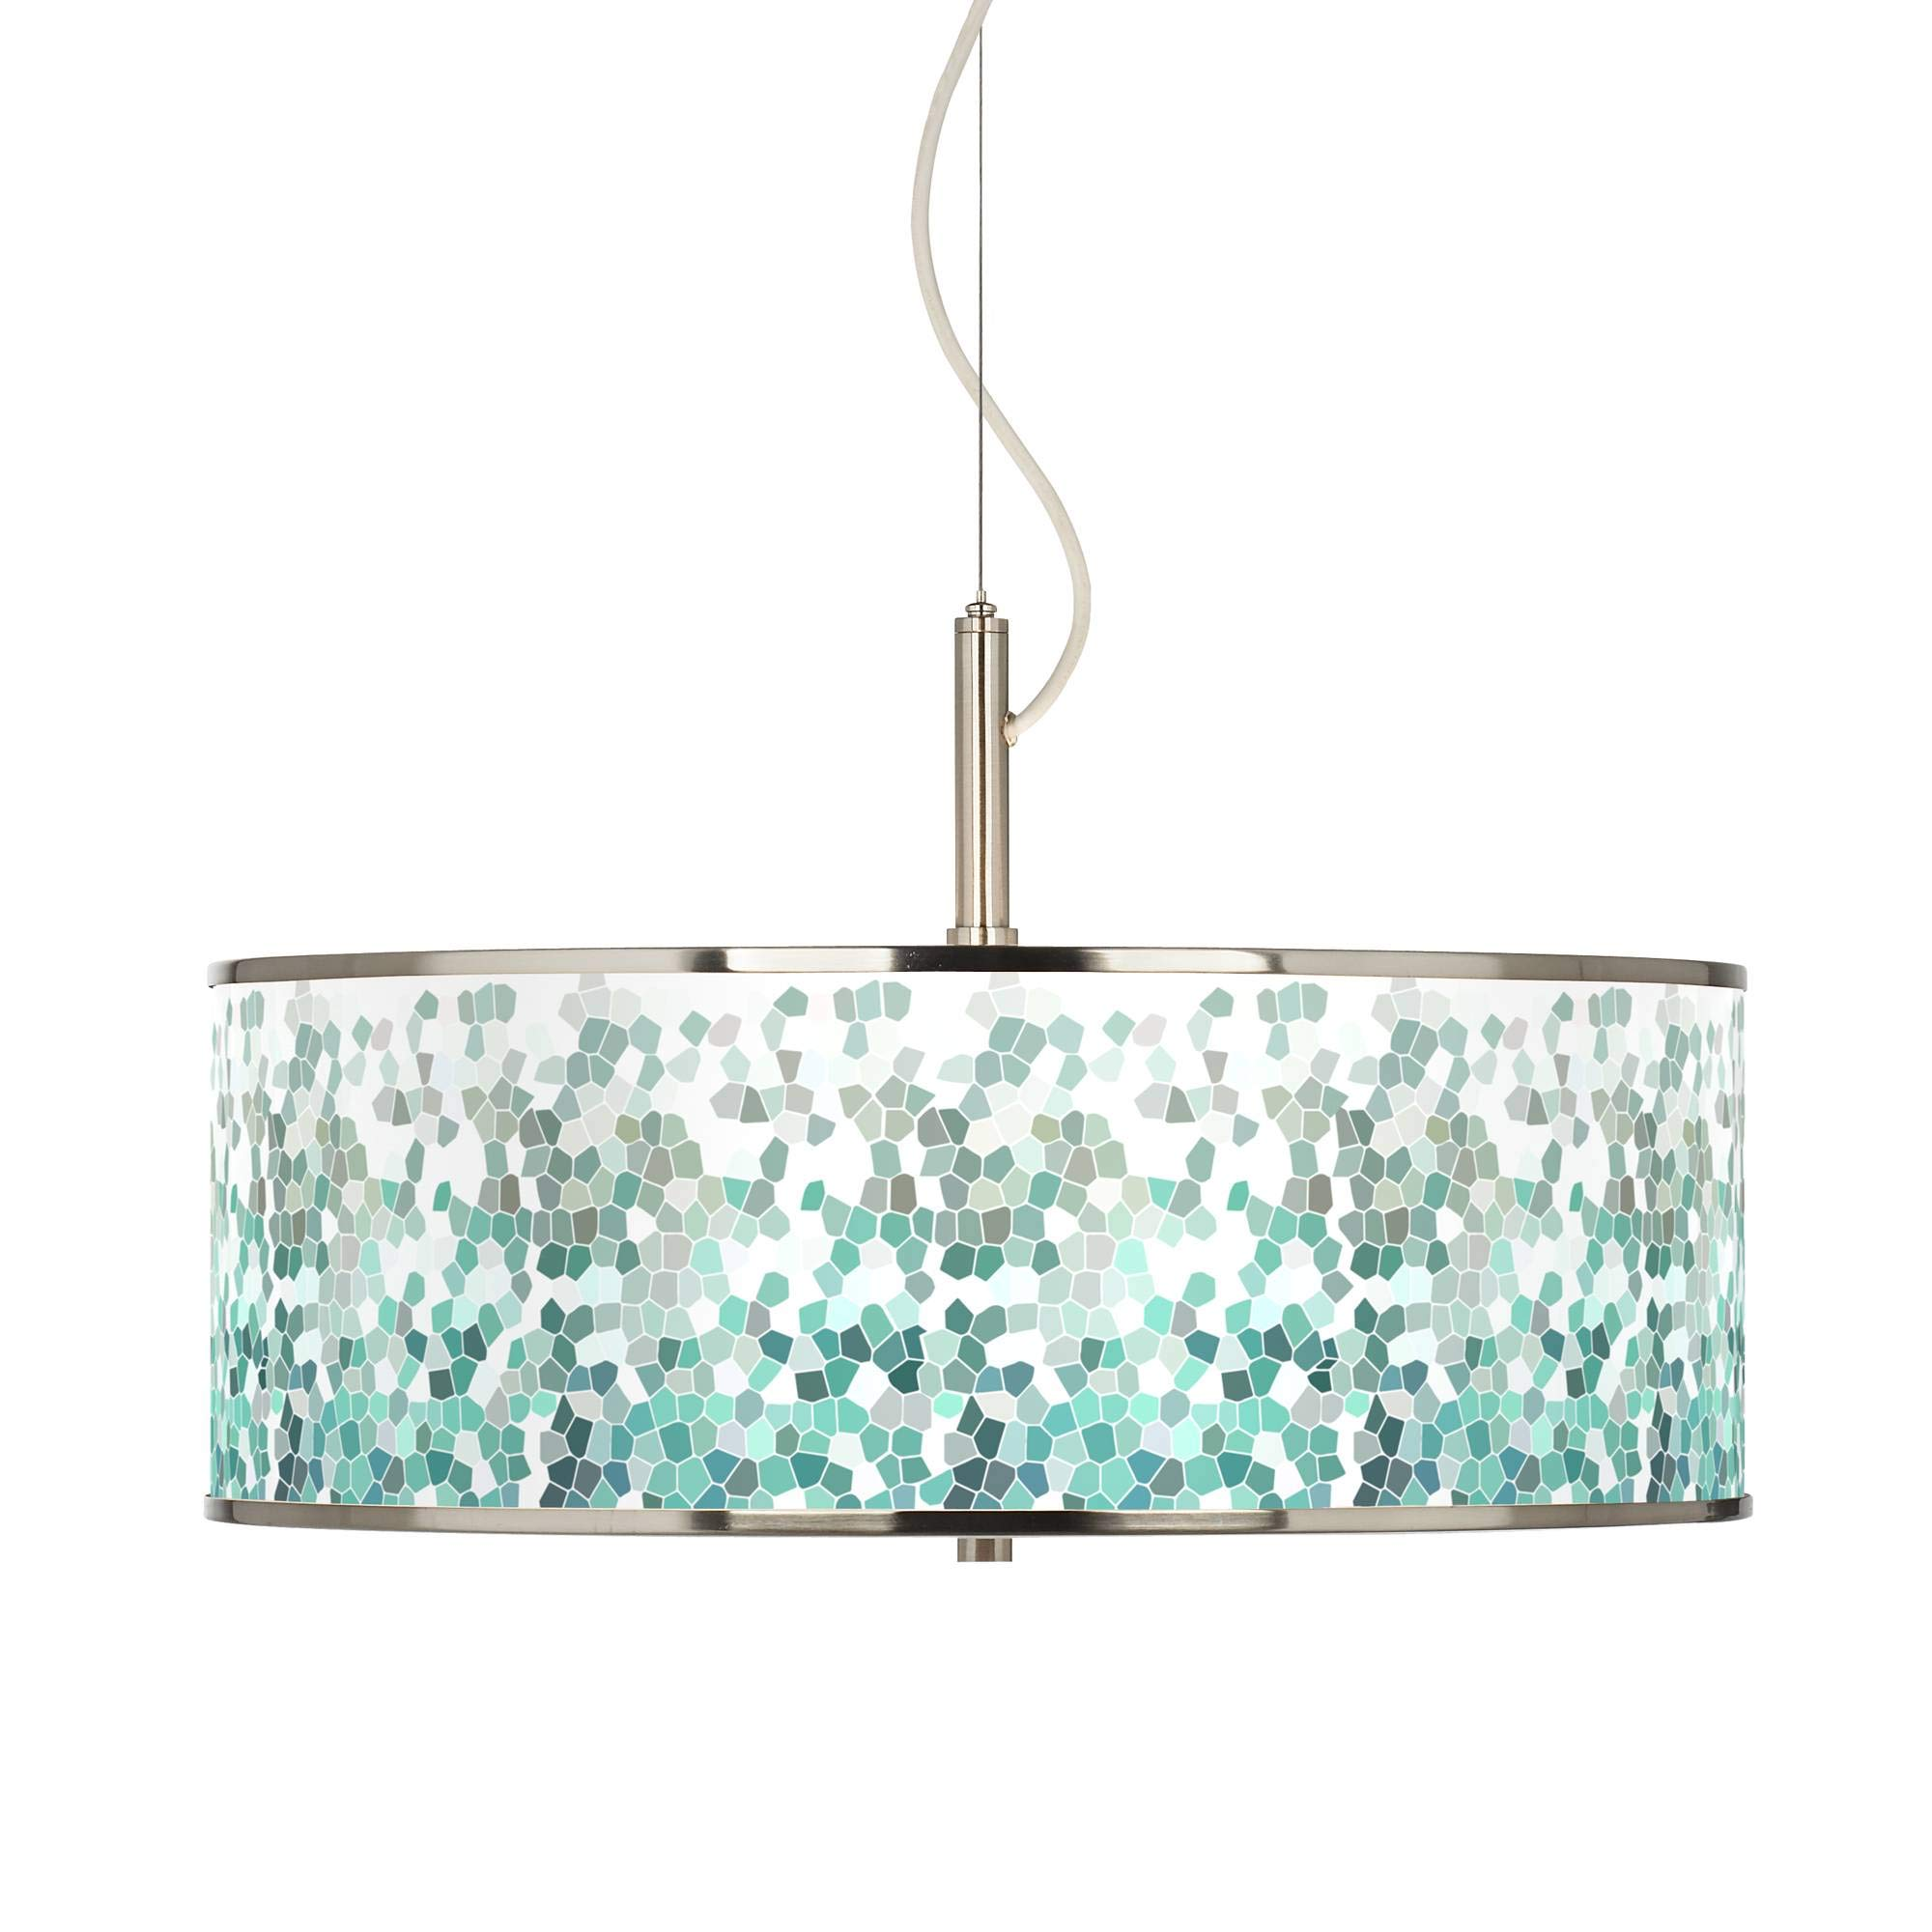 Aqua Mosaic Giclee Glow 20'' Wide Pendant Light - Giclee Glow